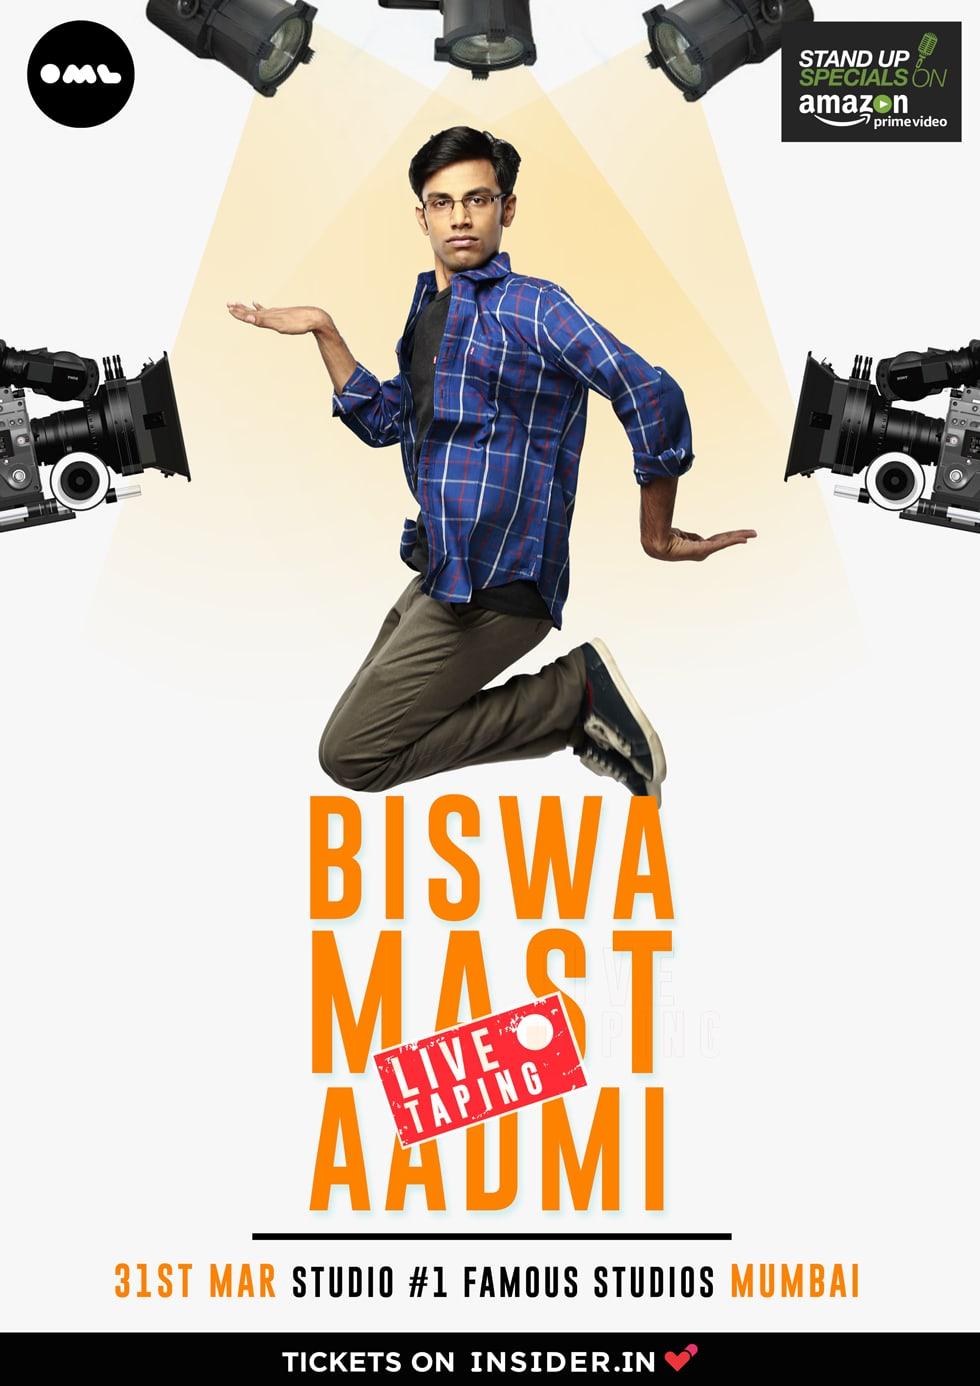 biswa mast aadmi review